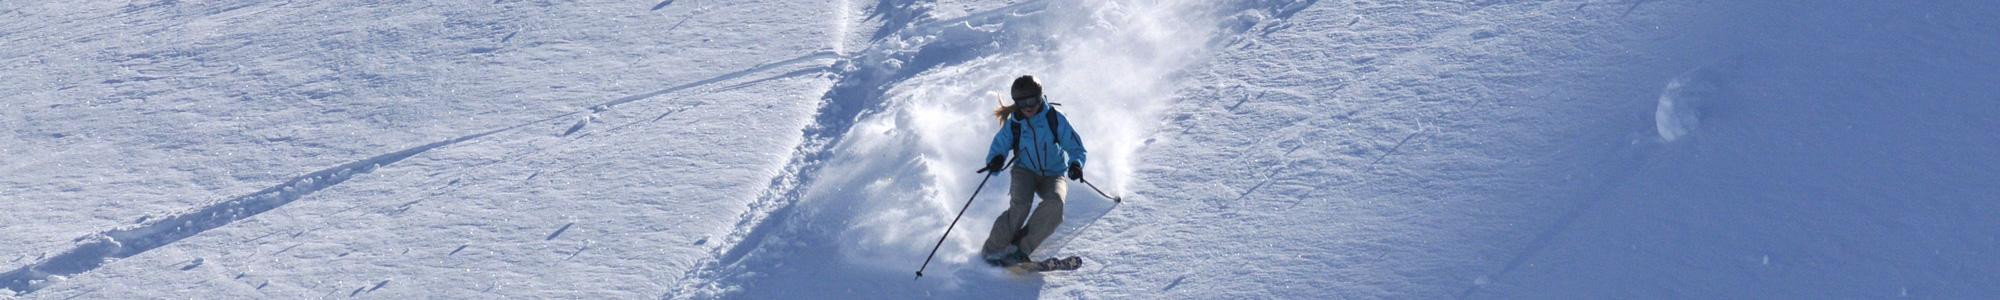 slide-ski-02